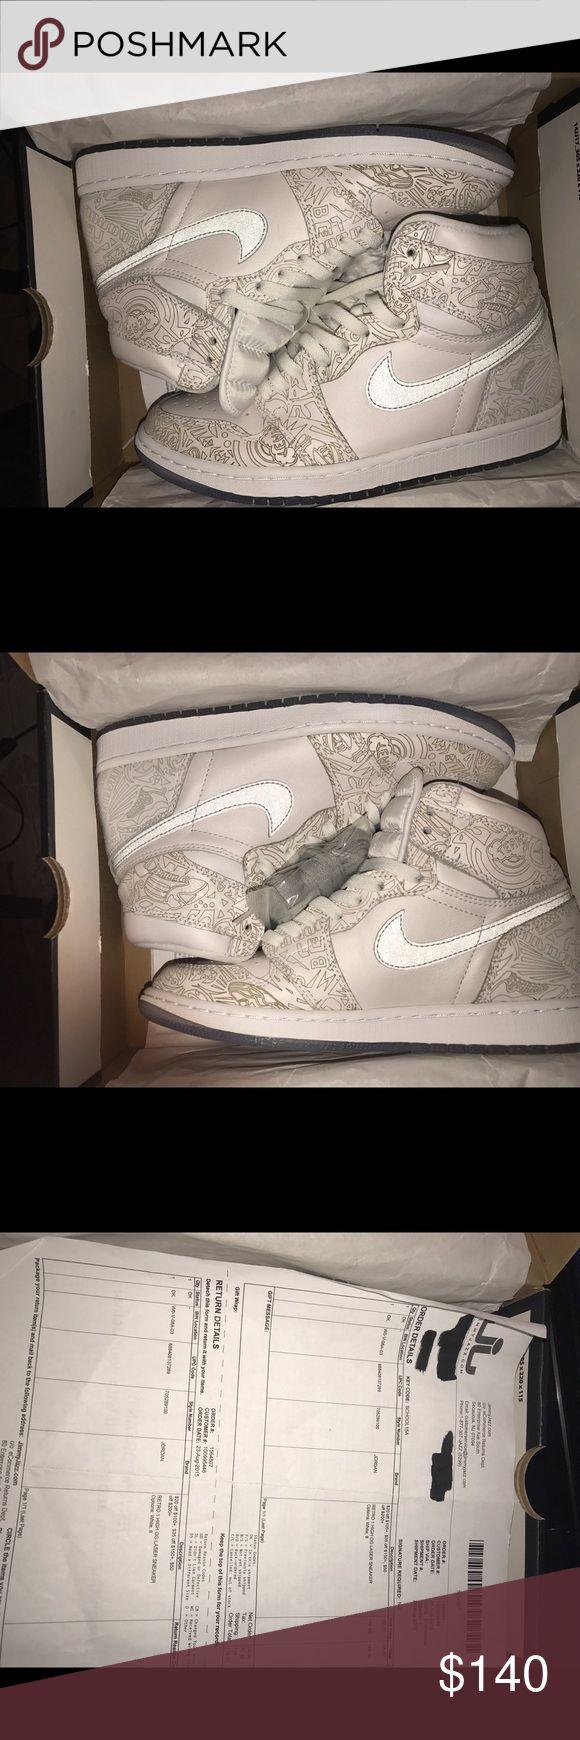 Air jordan 1 laser Used only warn 2 times condition 9/10 Jordan Shoes Sneakers